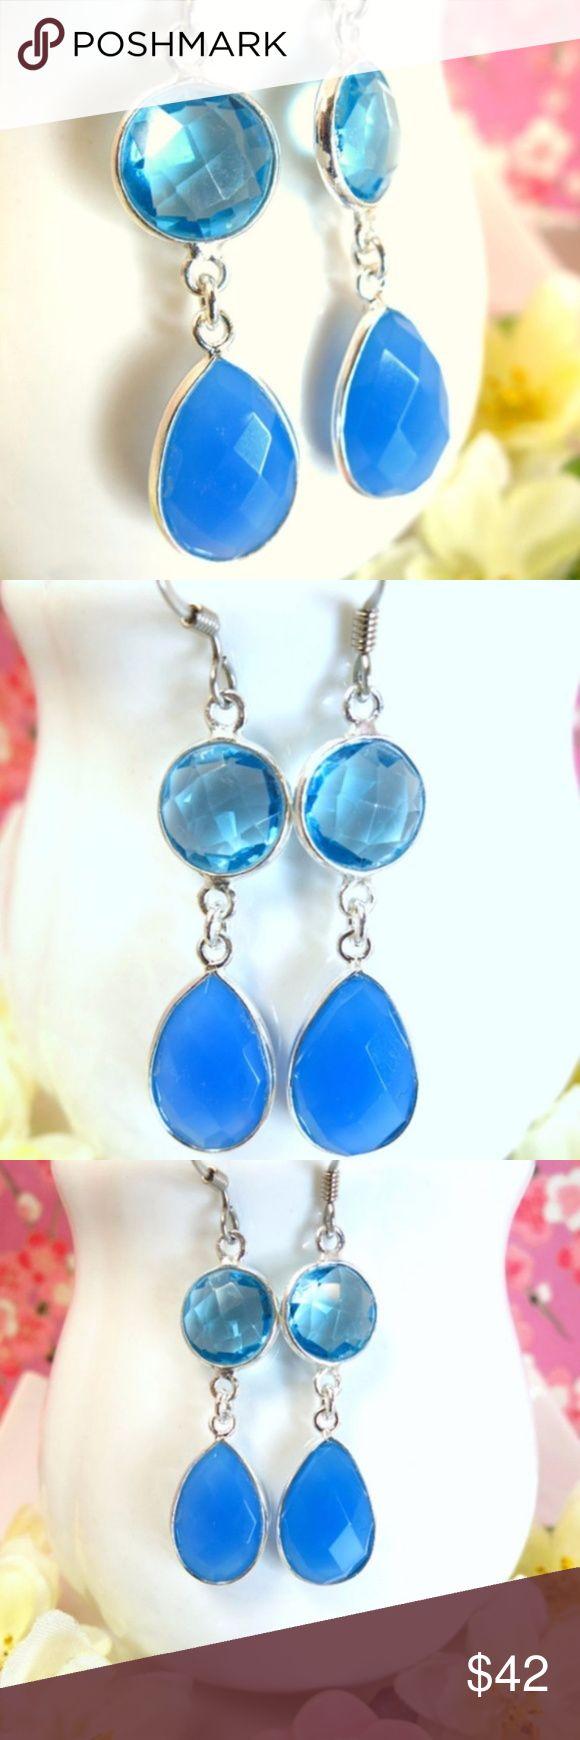 I just added this listing on Poshmark: Aqua blue quartz and blue chalcedony earrings. #shopmycloset #poshmark #fashion #shopping #style #forsale #Kblossoms #Jewelry